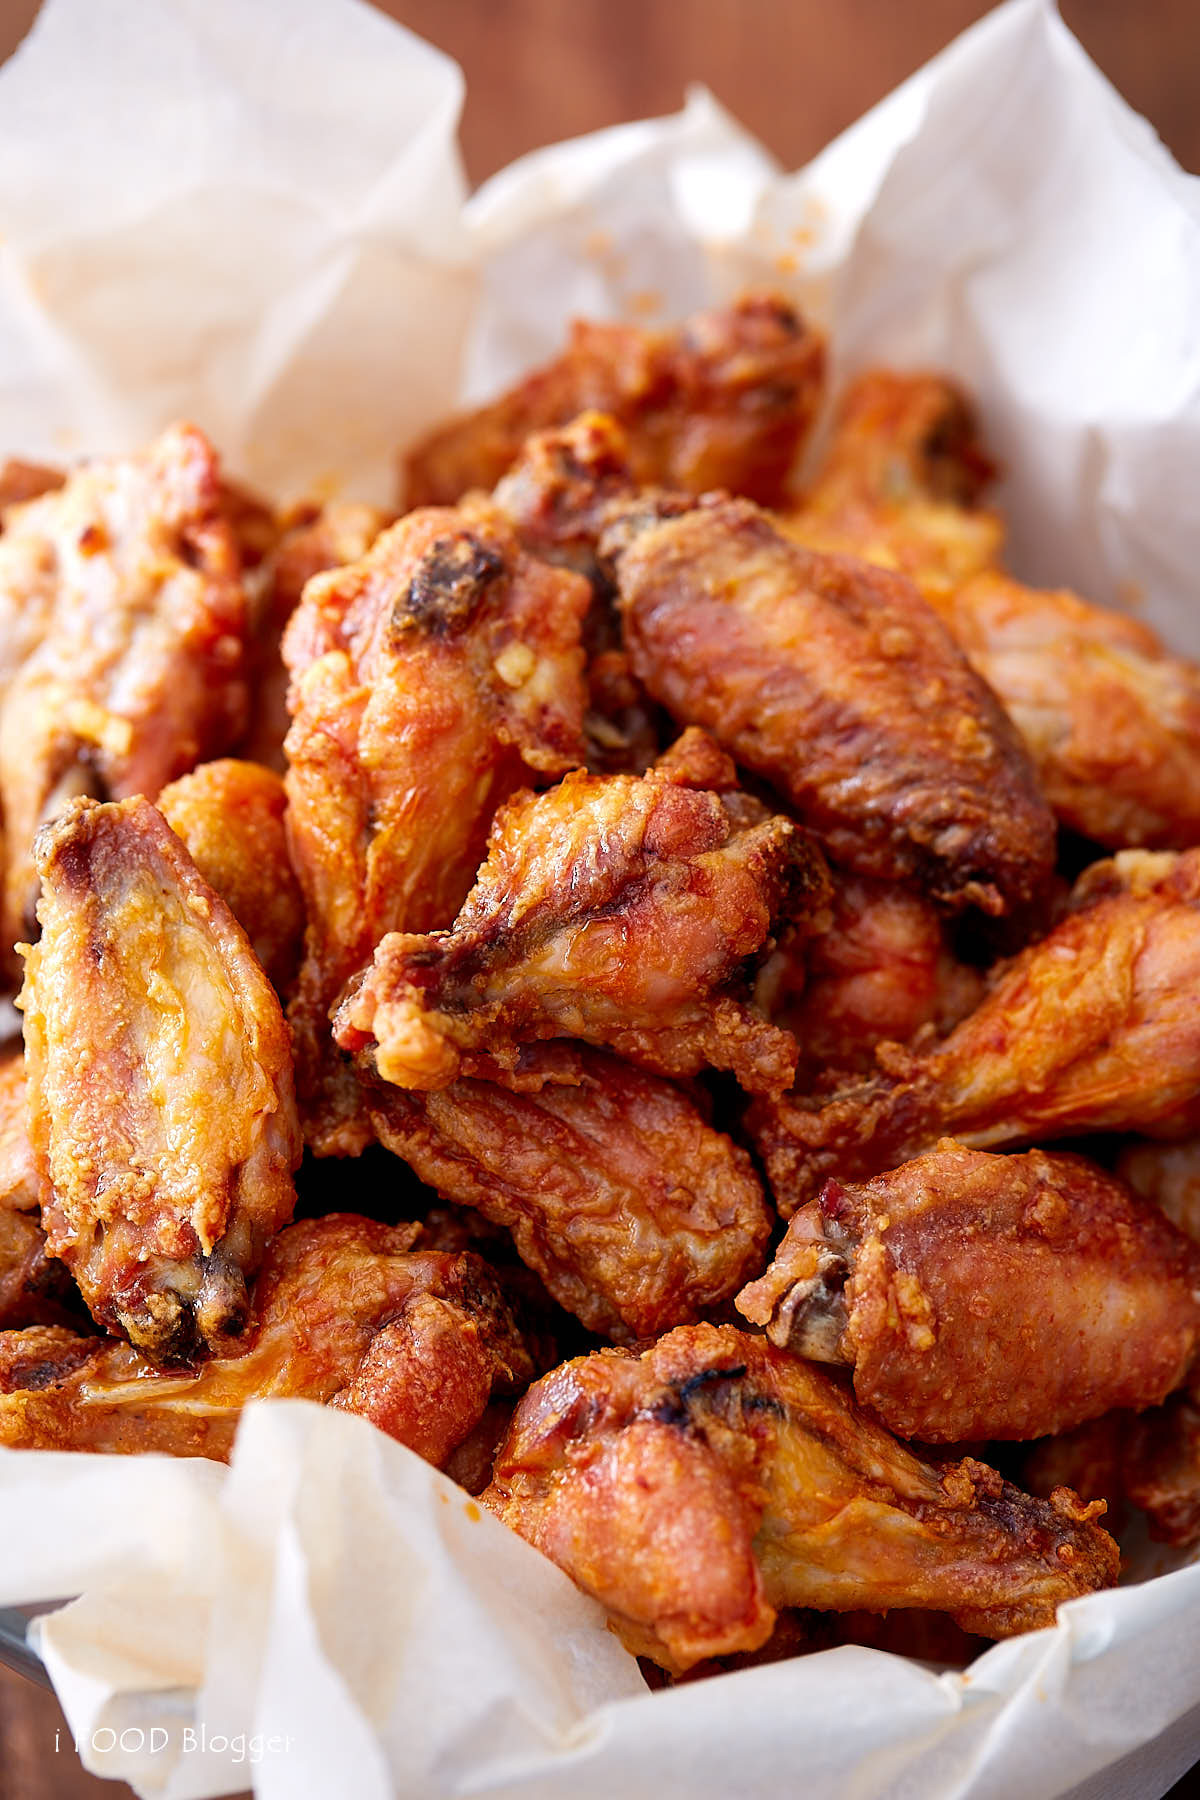 Baked Chicken Wings Crispy  Extra Crispy Baked Chicken Wings i FOOD Blogger